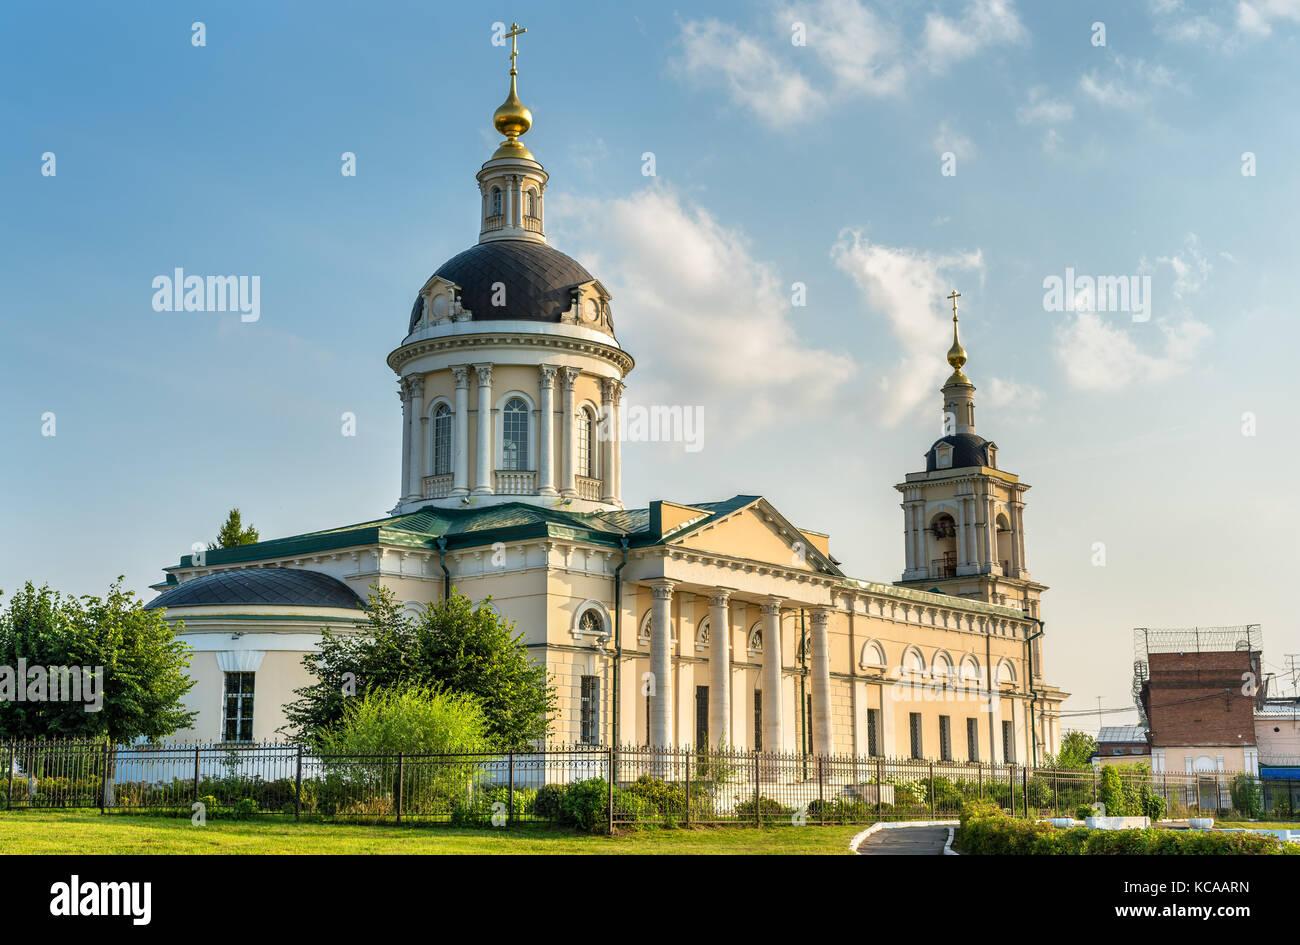 Archangel Michael Church in Kolomna, Russia Stock Photo